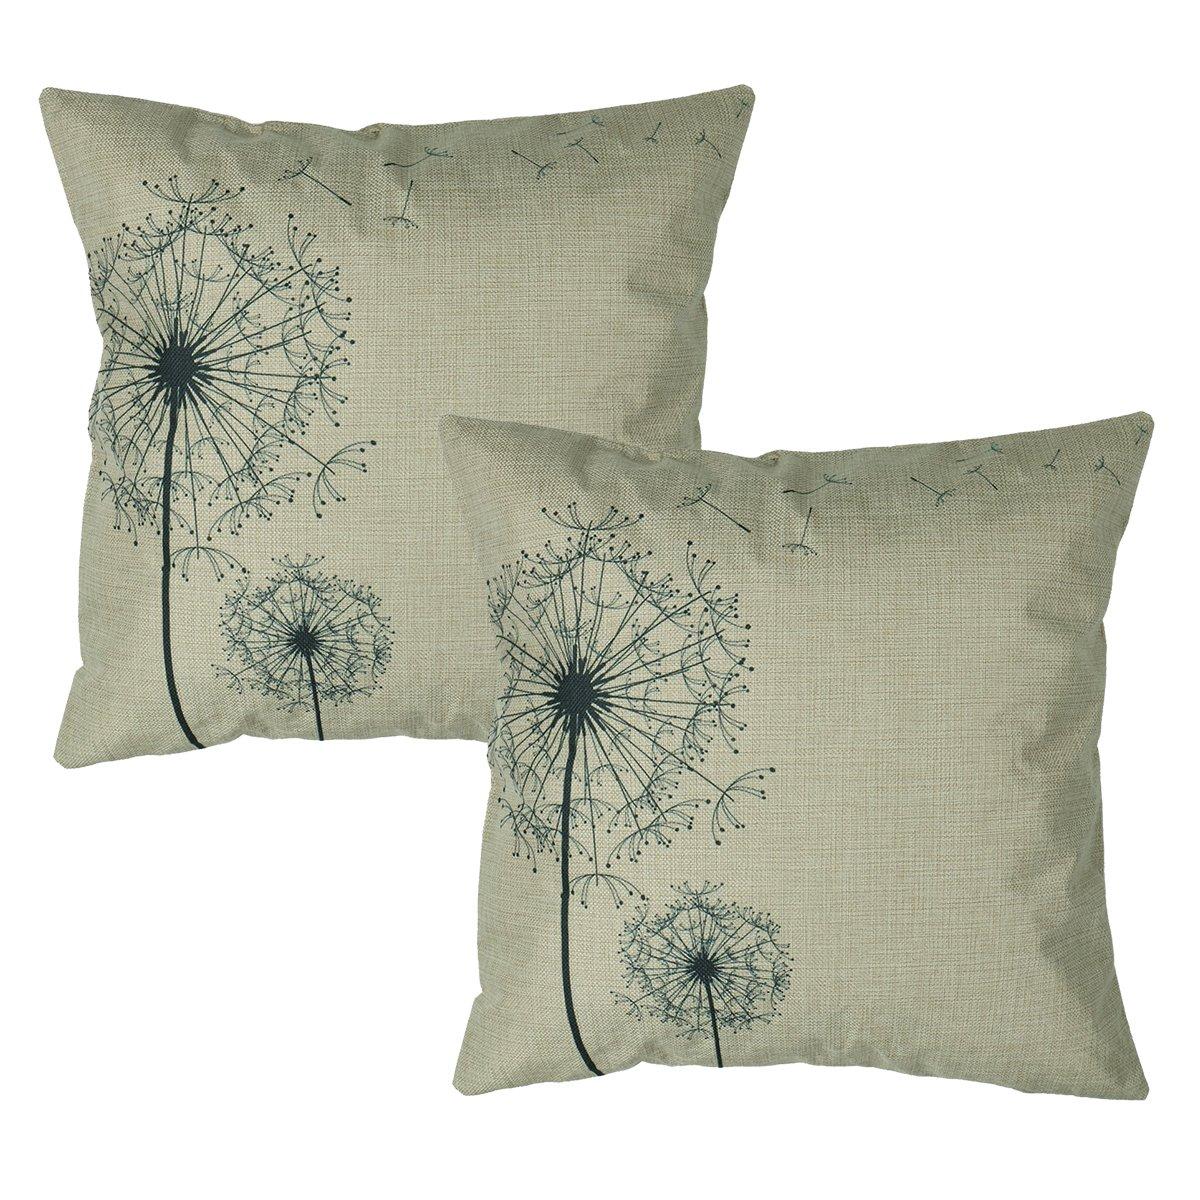 Luxbon Set 2Pcs Morden Stylish Simplicity Farmhouse Dandelion Floral Decor As You Wish Cotton Linen Throw Pillow Cases Sofa Couch Chair Decorative Cushion Covers 18''x18''/45x45cm Insert Not Included